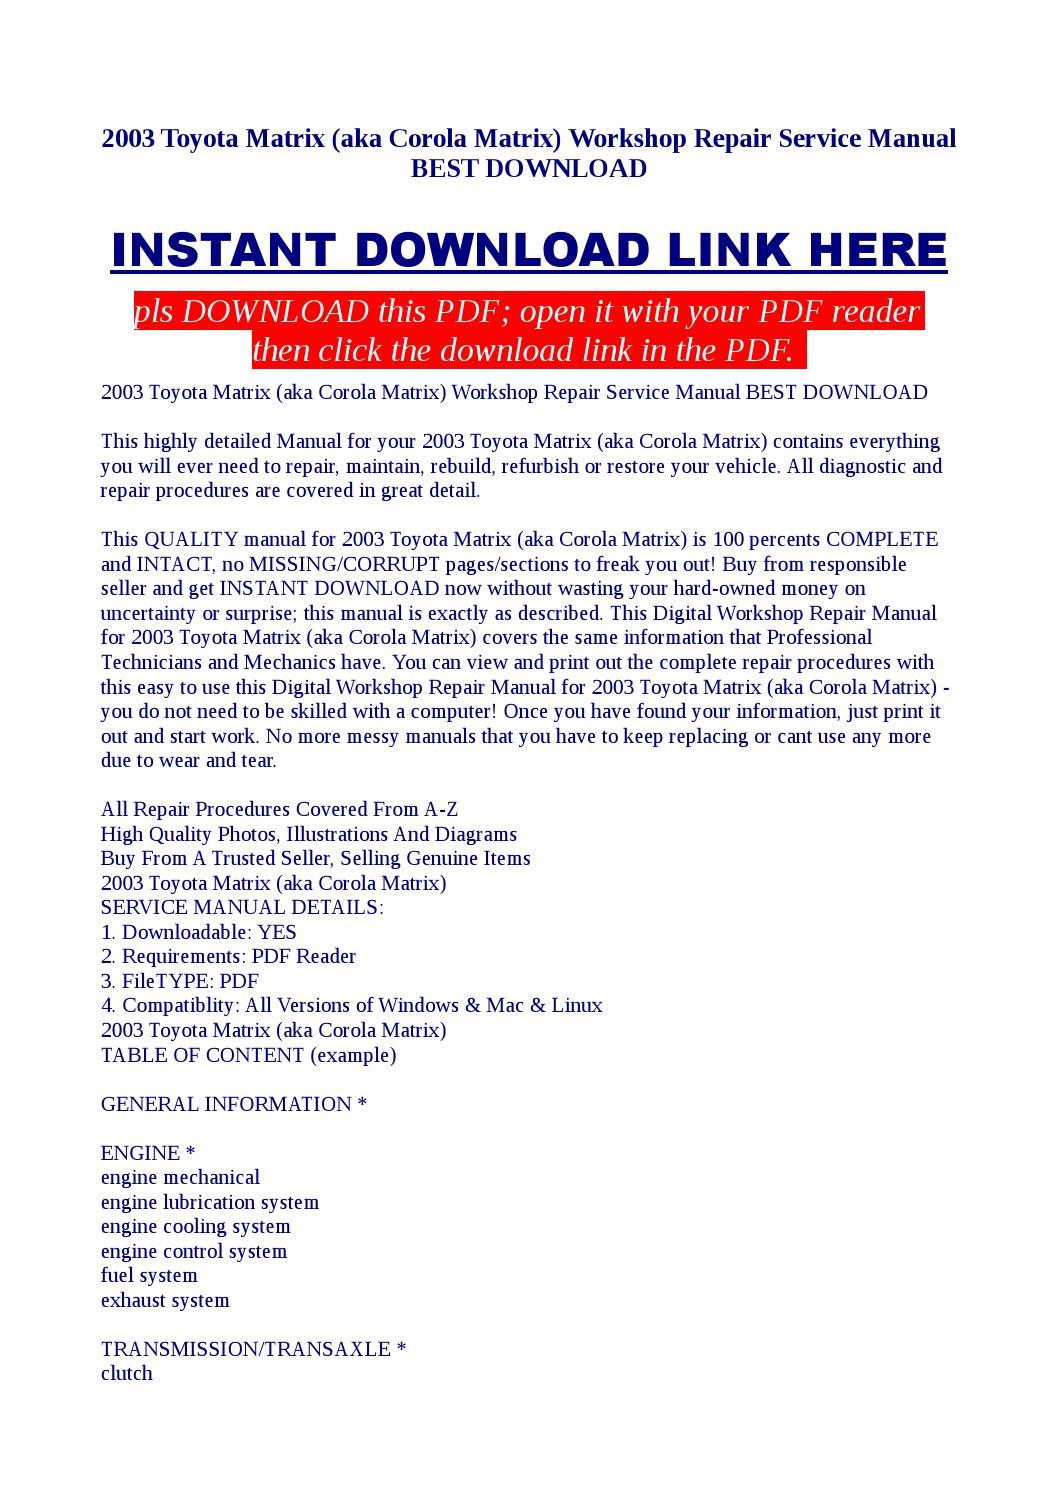 2003 toyota matrix (aka corola matrix) workshop repair service manual best  download by Kato Syomo - issuu